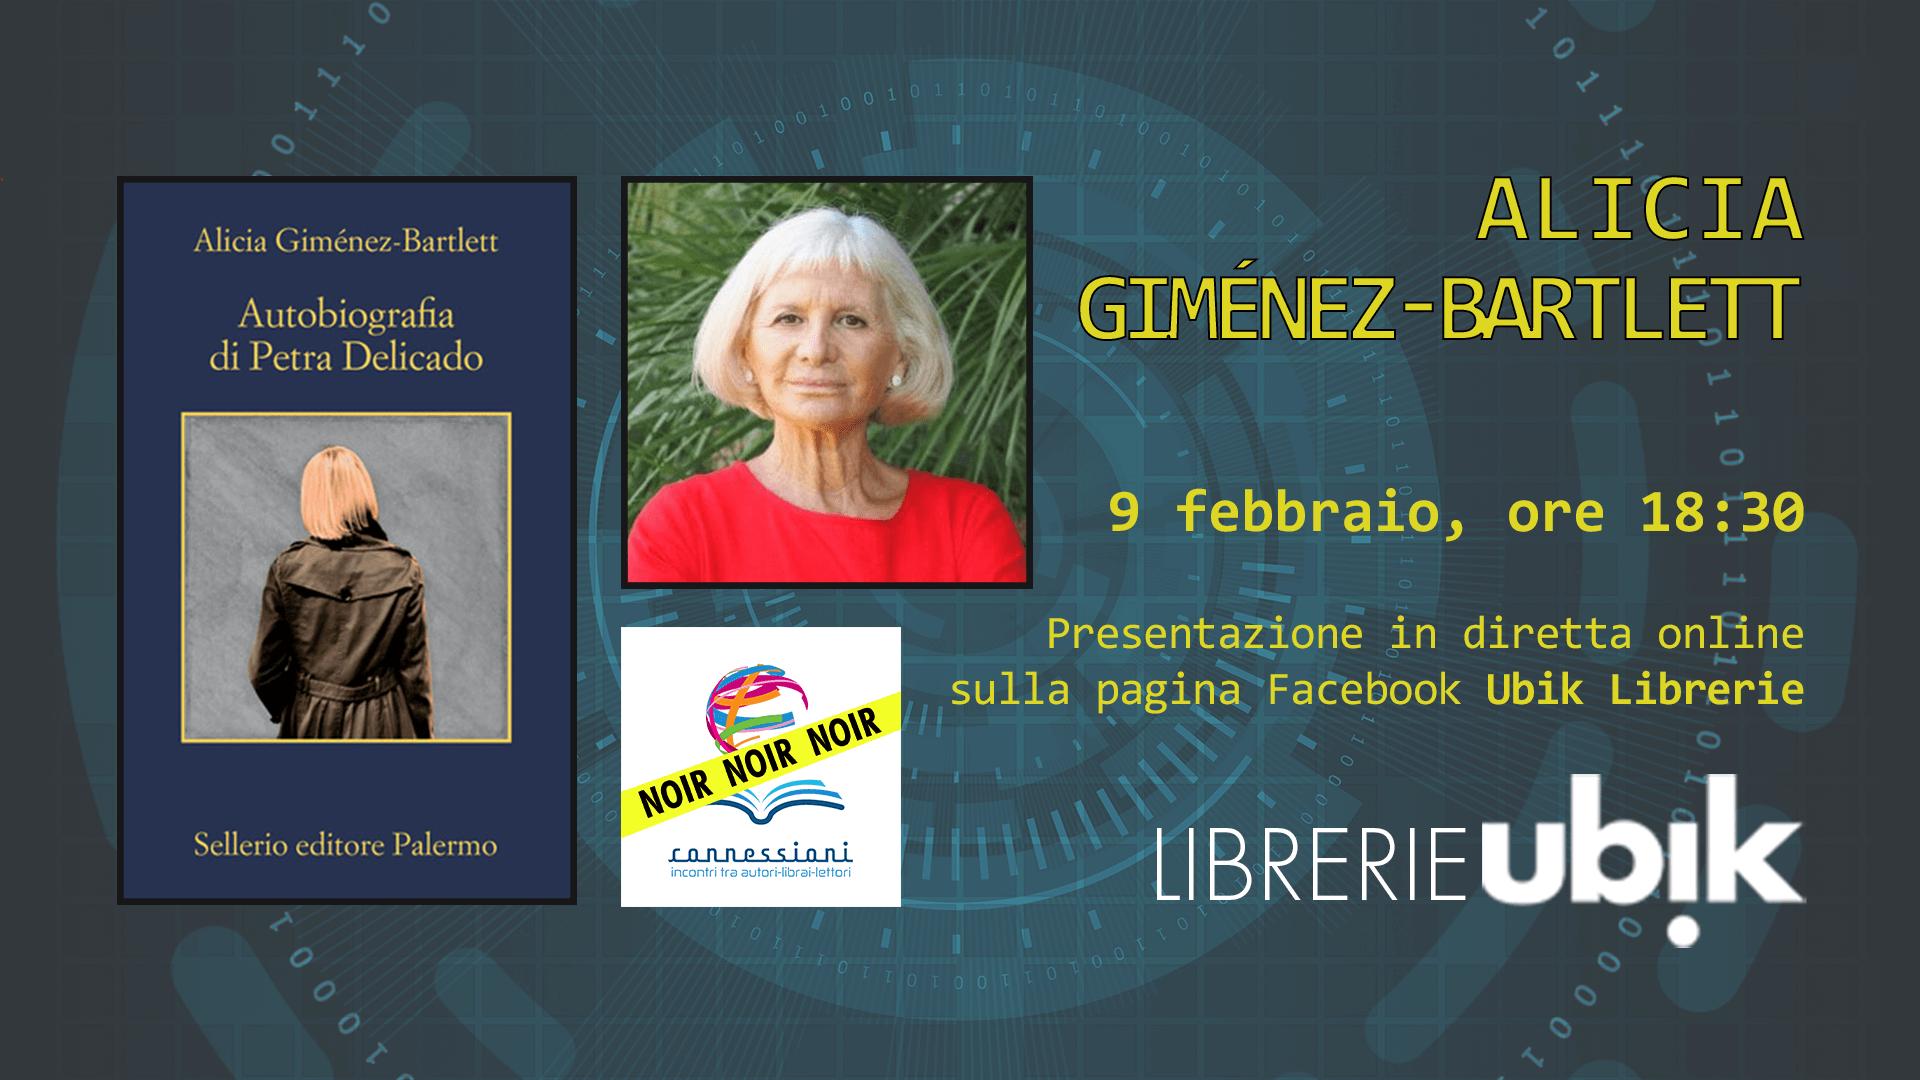 ALICIA GIMÉNEZ-BARTLETT presenta in diretta online